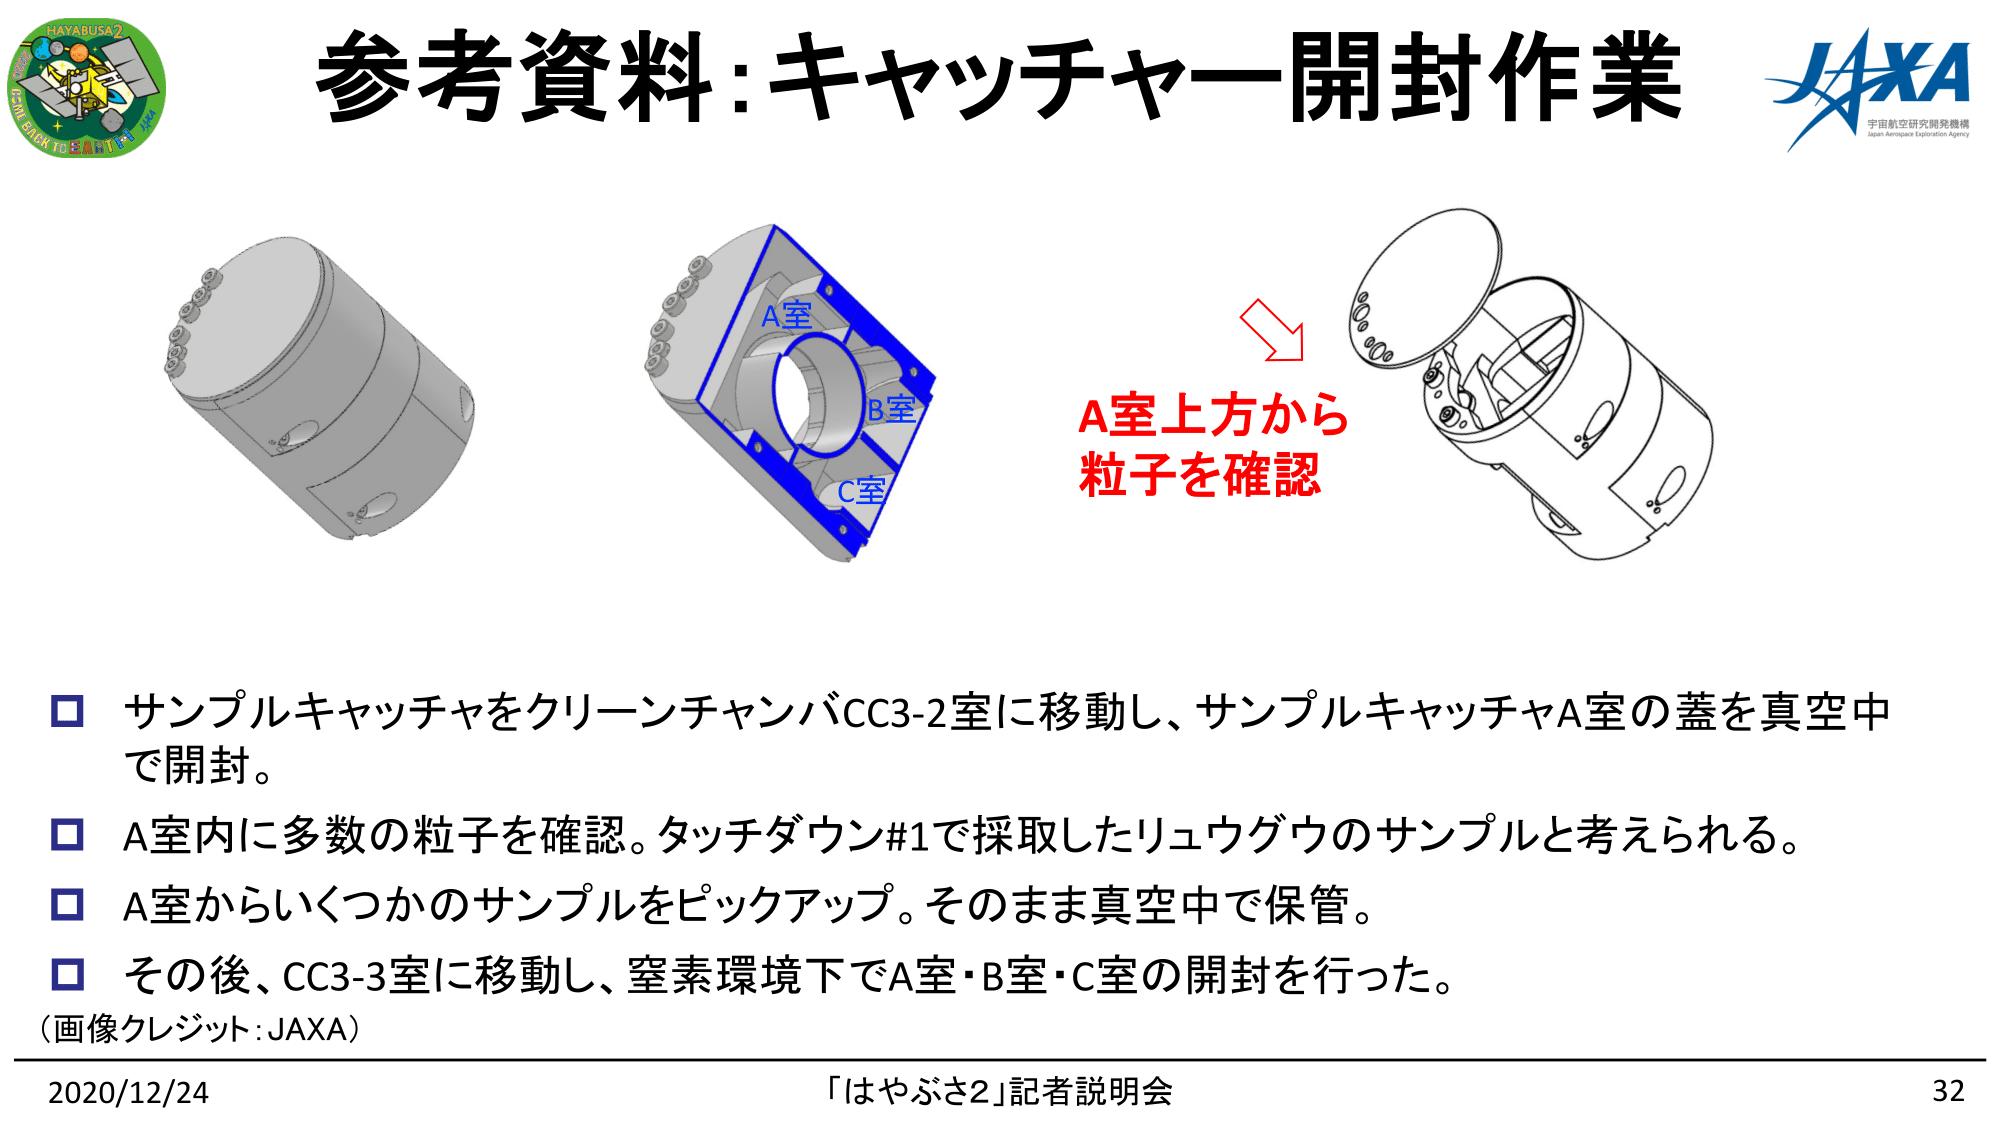 f:id:Imamura:20201224135344p:plain